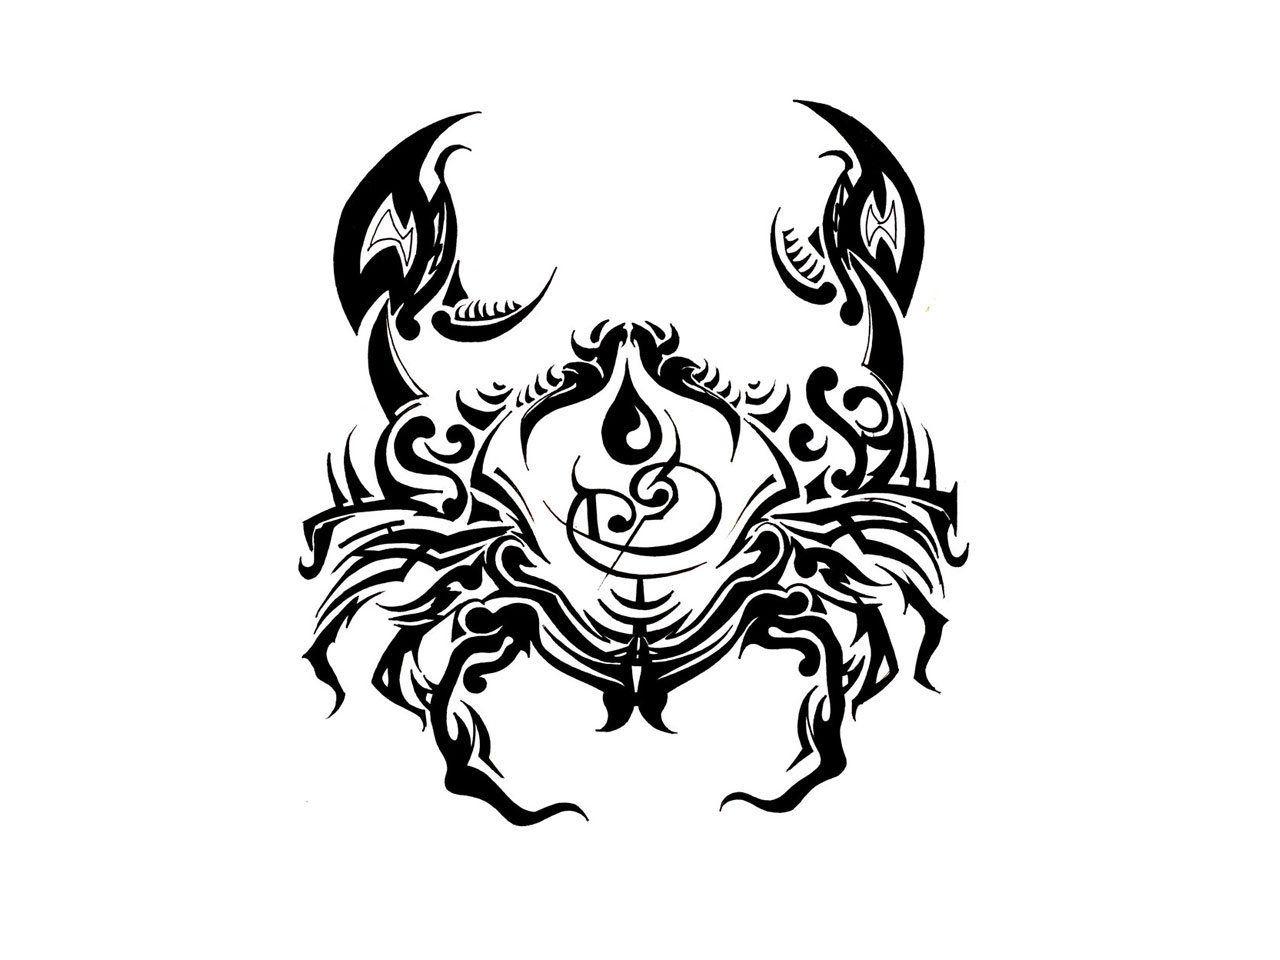 Cancer zodiac tattoo designs nice cancer zodiac tattoo designs cancer tattoo is really hot aries tattoos for zodiac picture 925 biocorpaavc